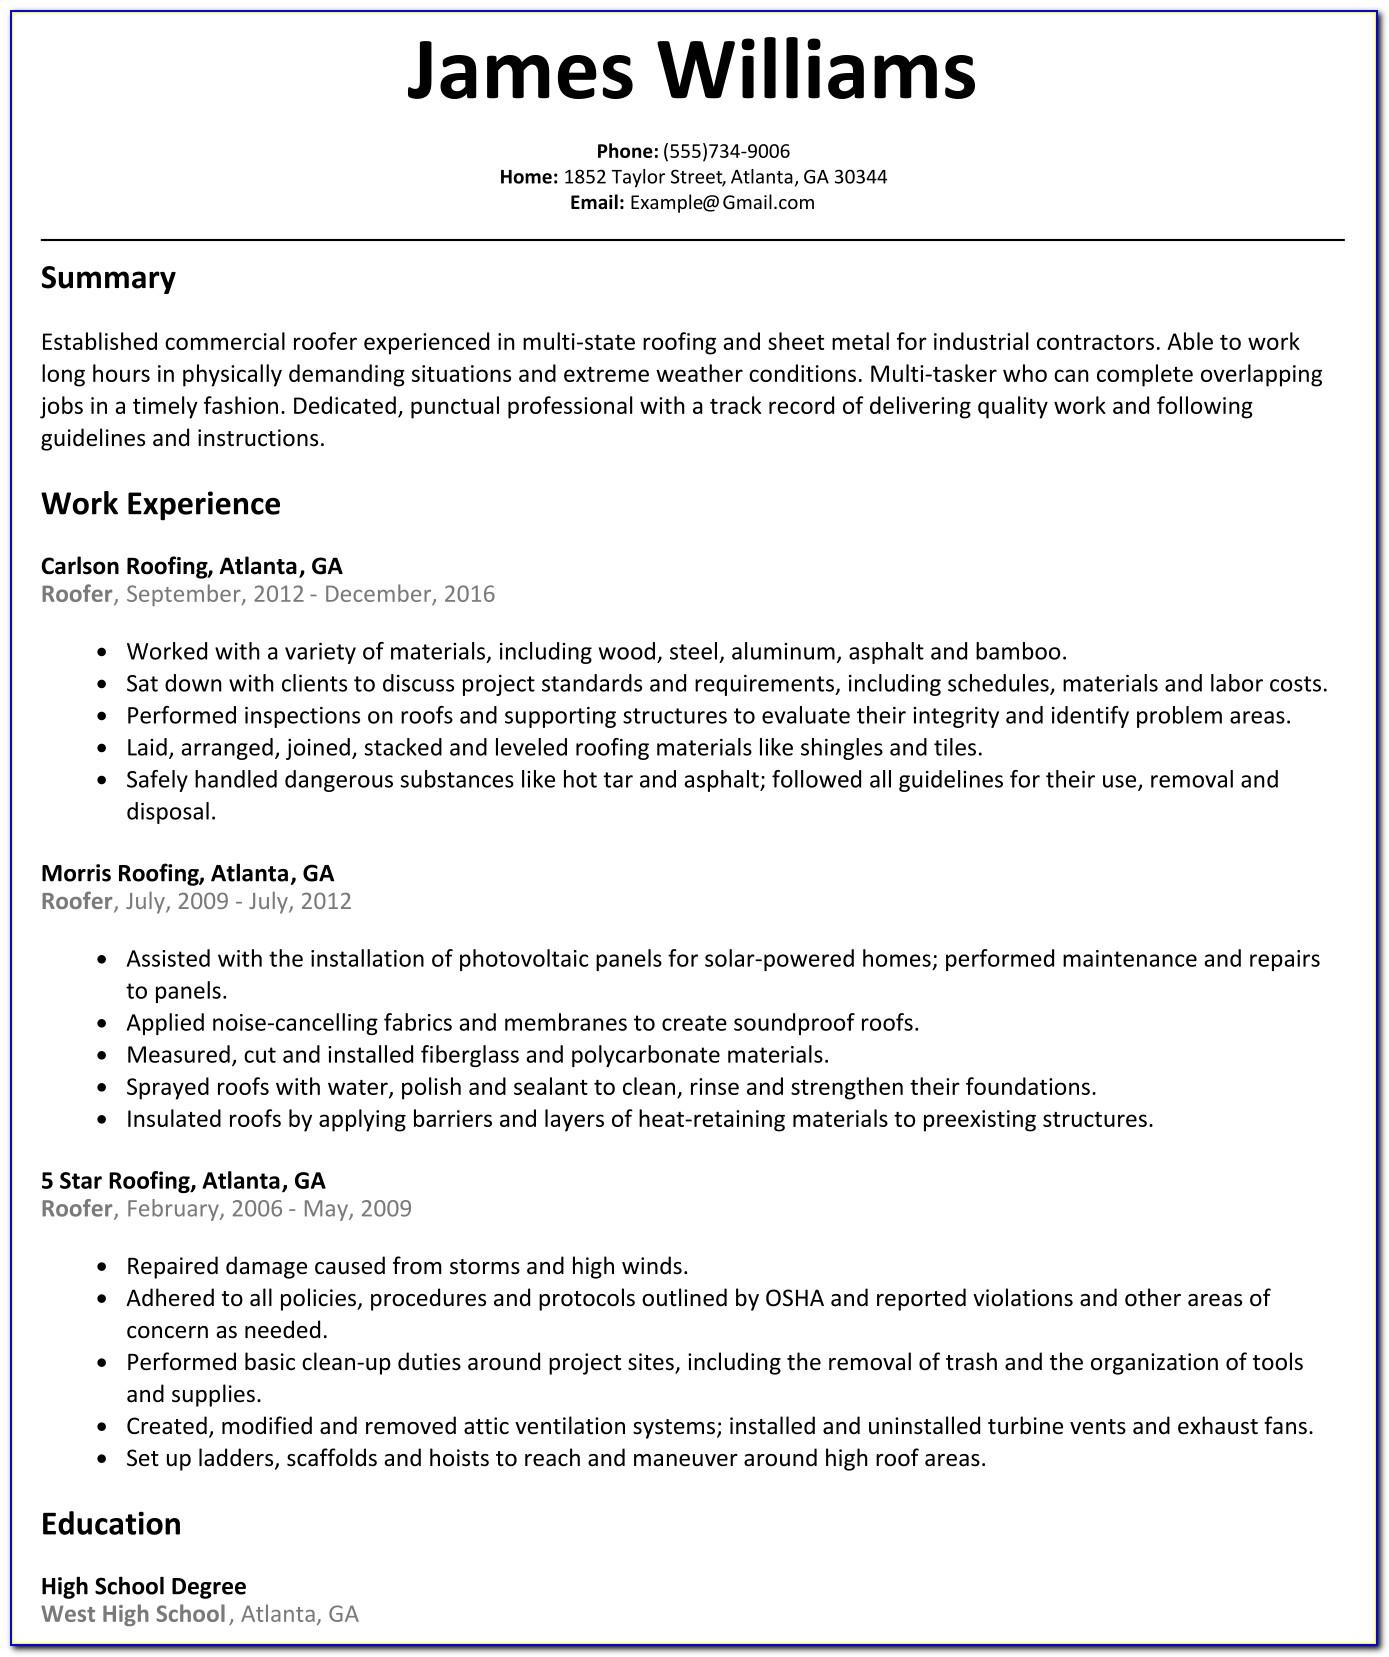 Free Resume Creator Australia